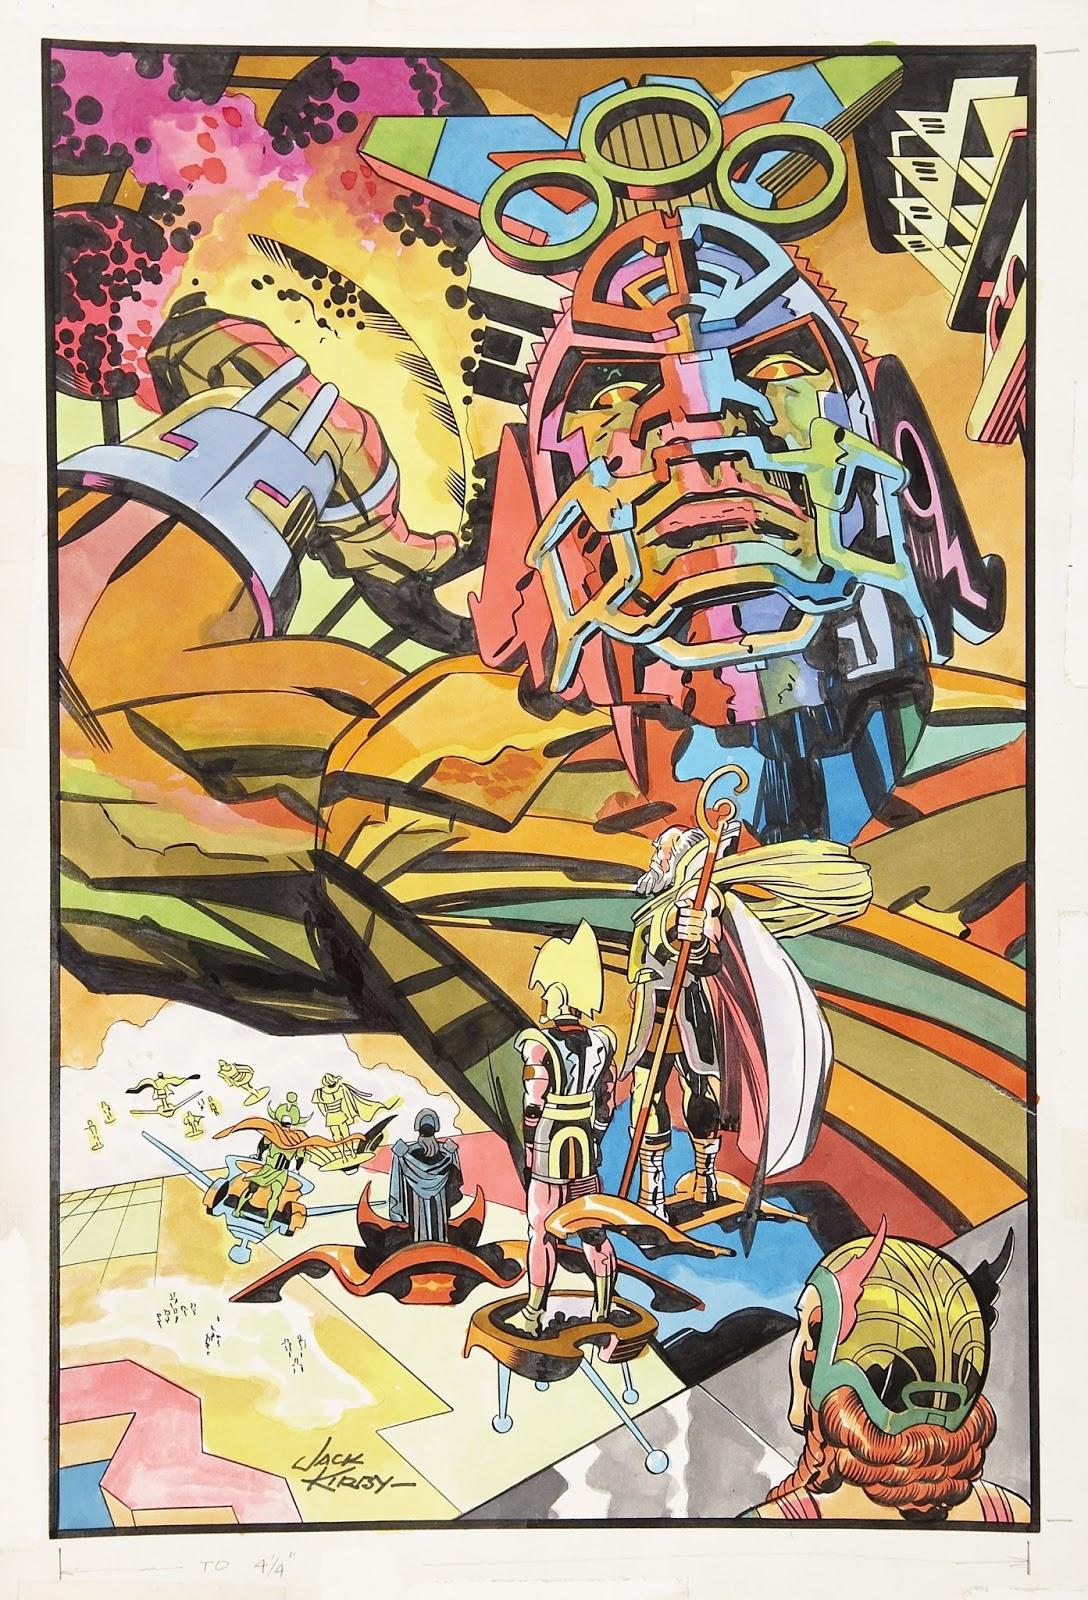 Cap'n's Comics: Kosmic Football by Jack Kirby Jack Kirby Art